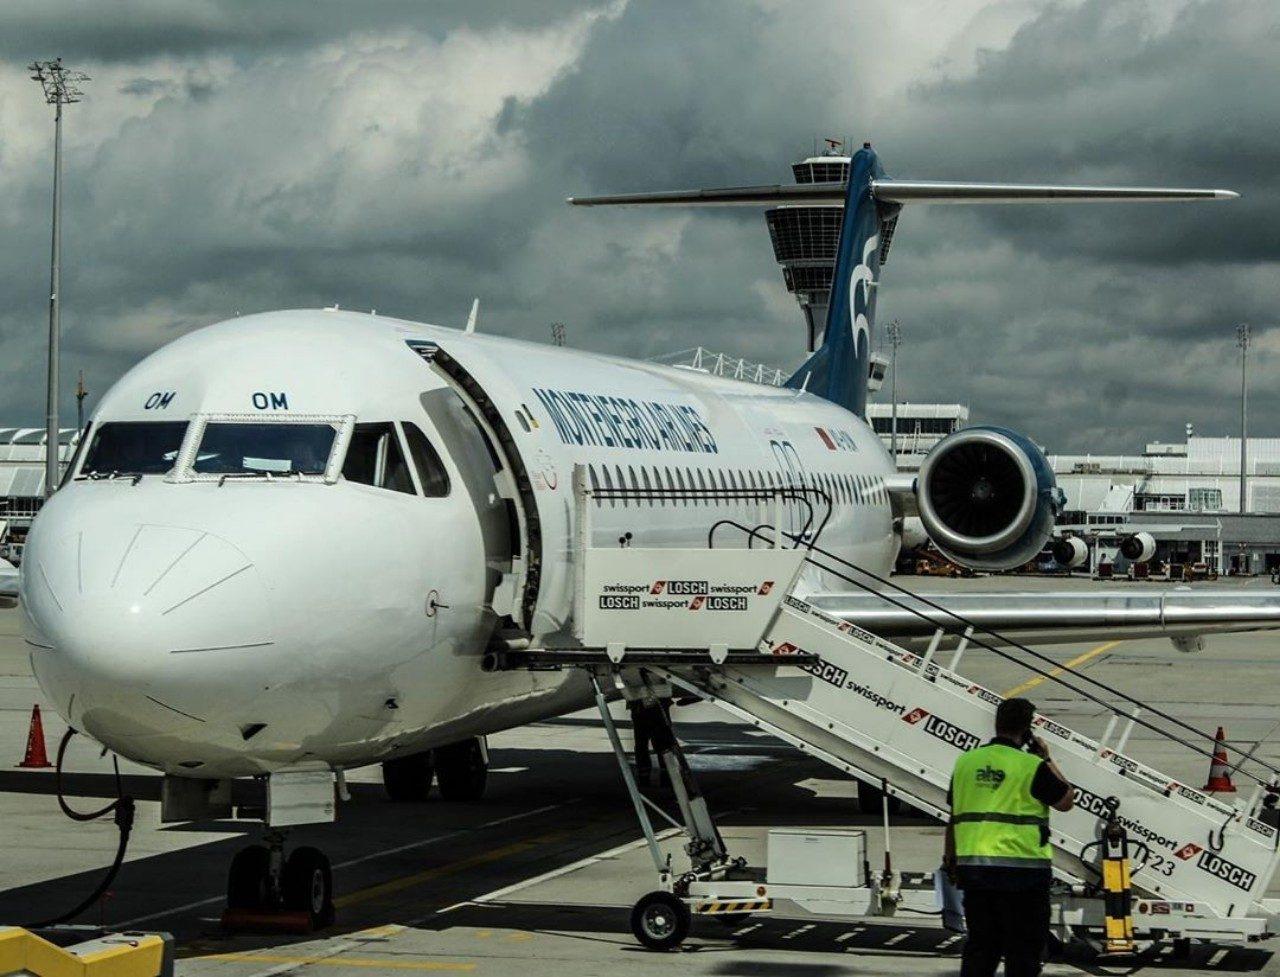 Radno vrijeme Montenegro Airlinesa tokom praznika